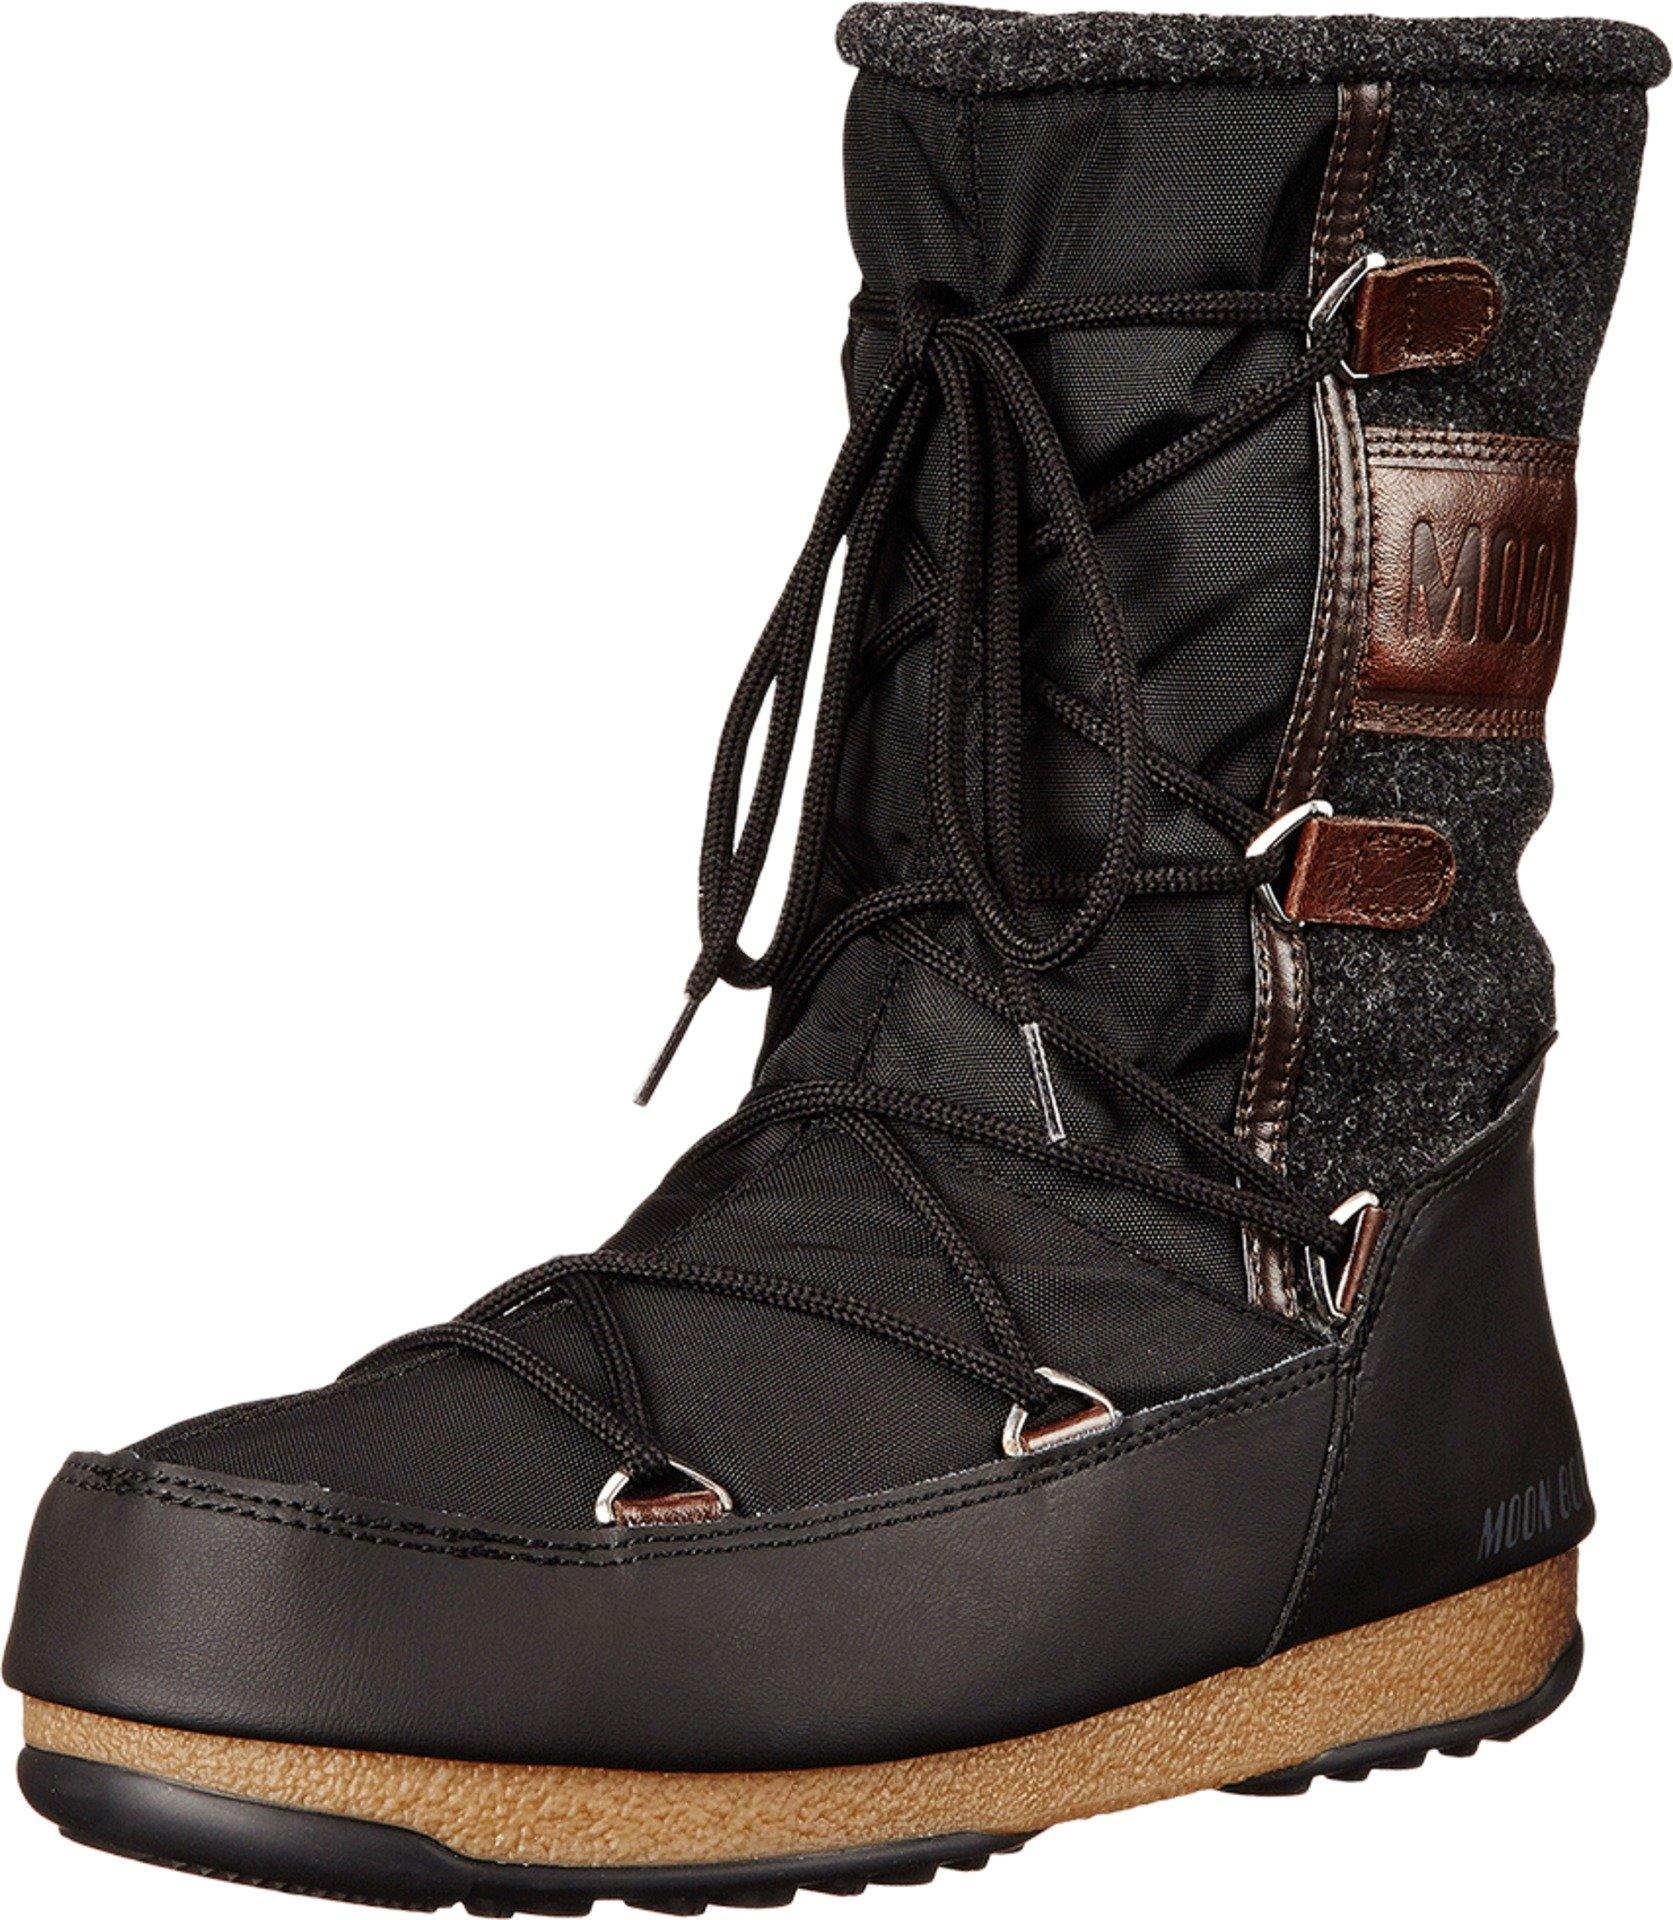 Tecnica Women's Moon W.E. Vienna Felt Winter Fashion Boot, Black, 40 EU/8.5 M US